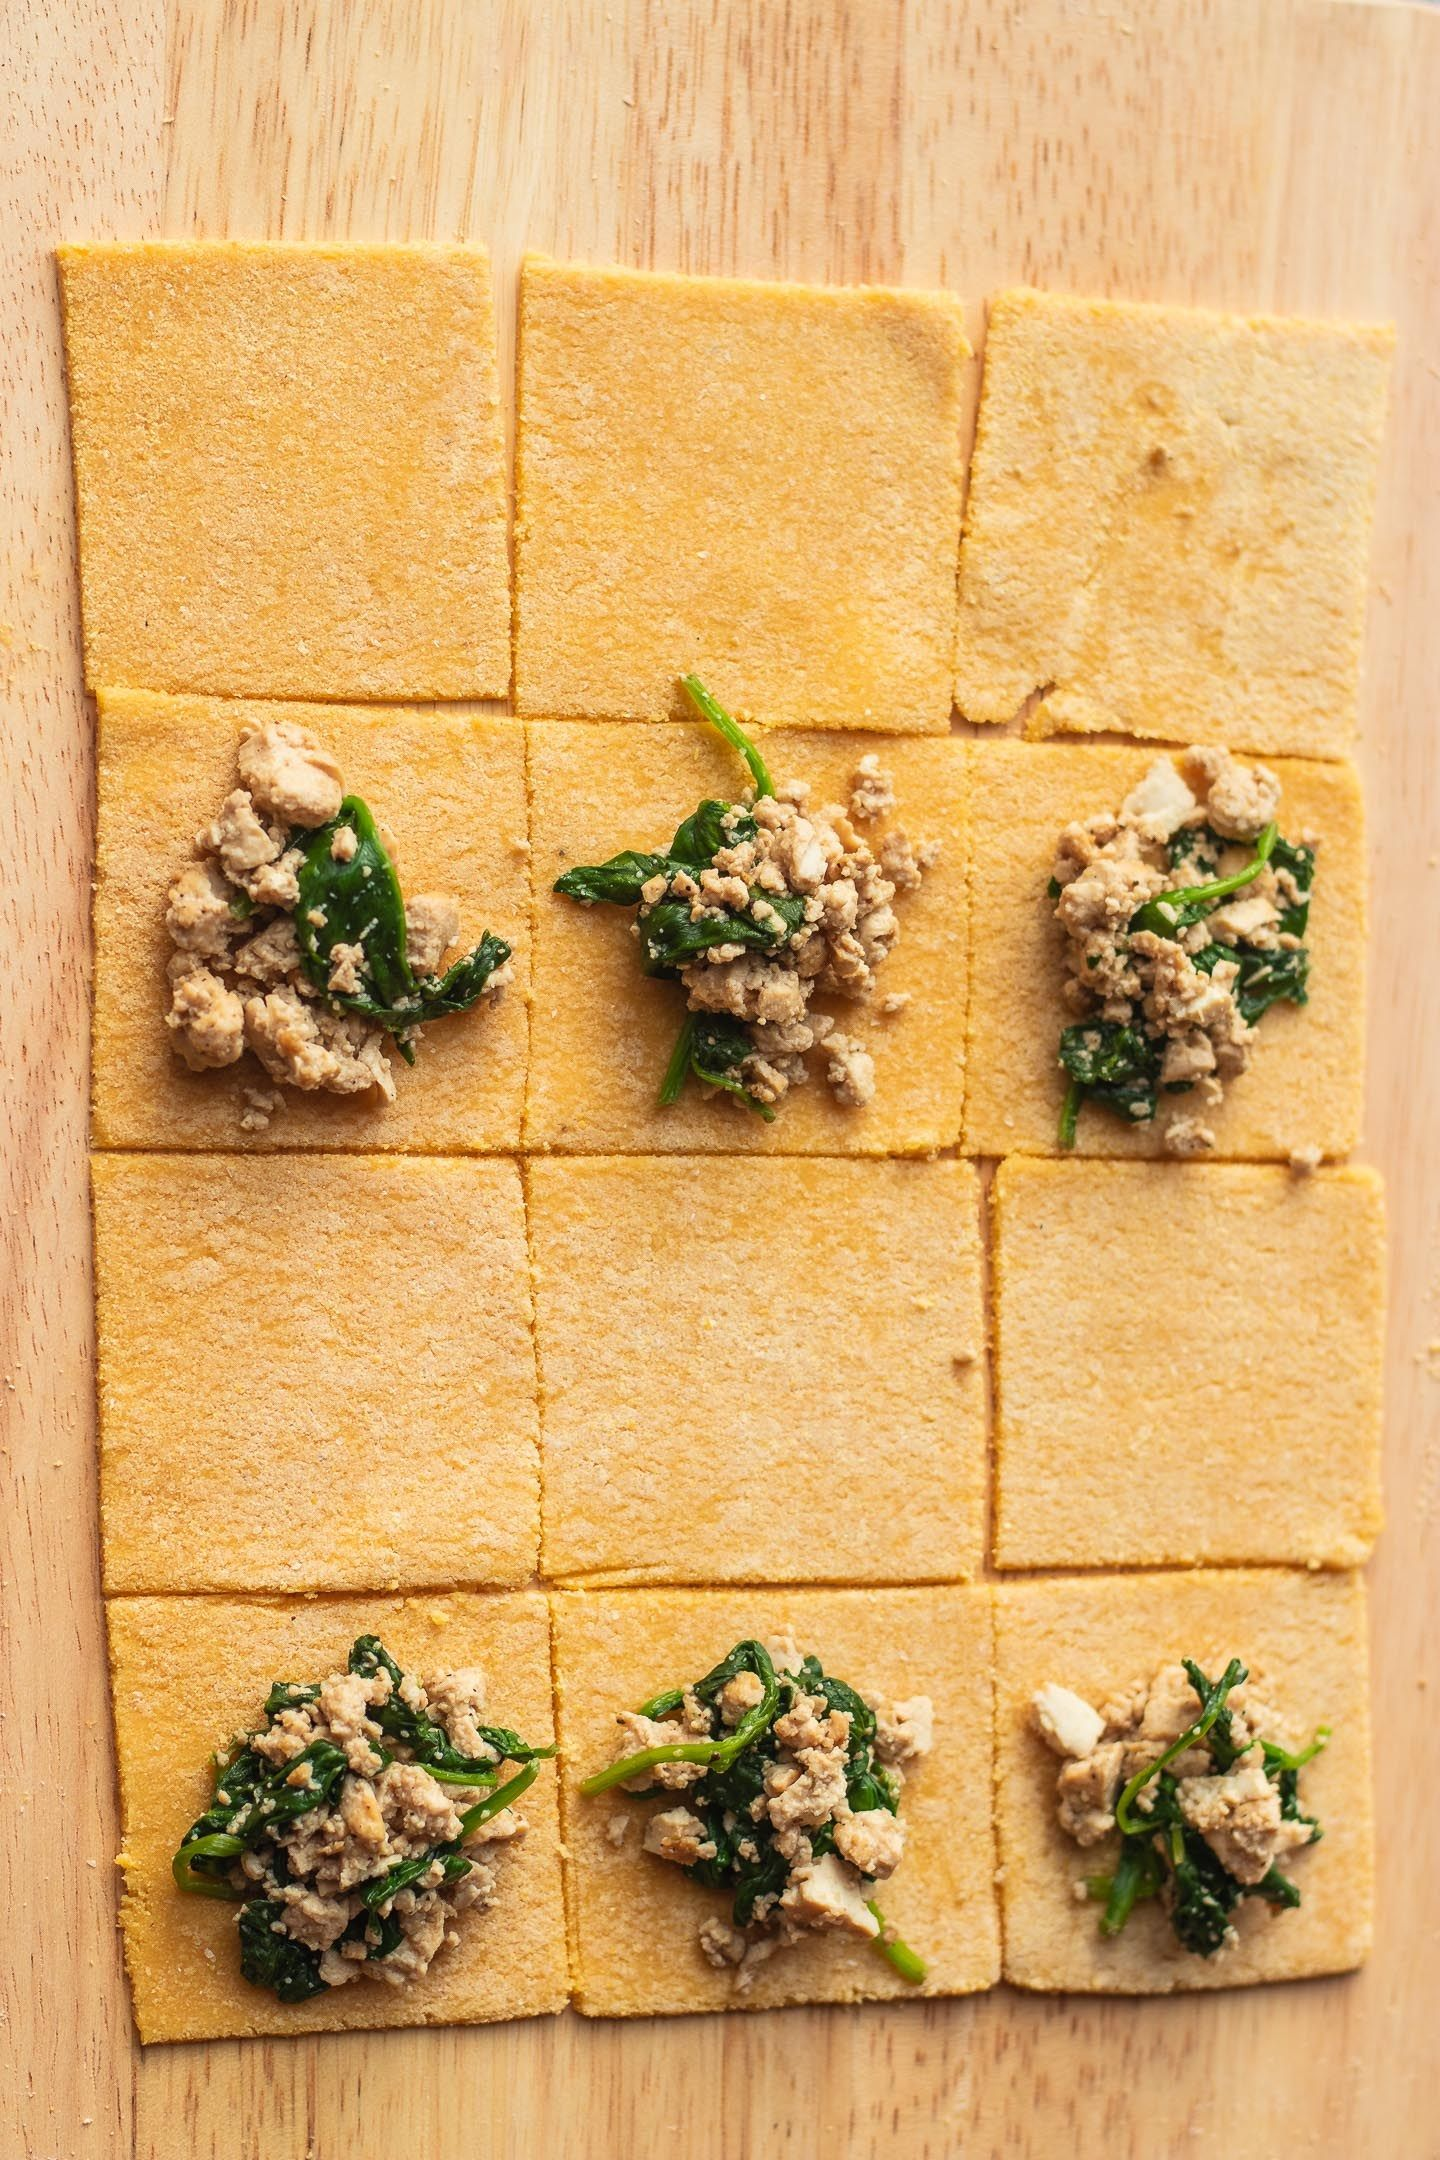 Homemade Vegan Ravioli With Tofu And Spinach Recipe